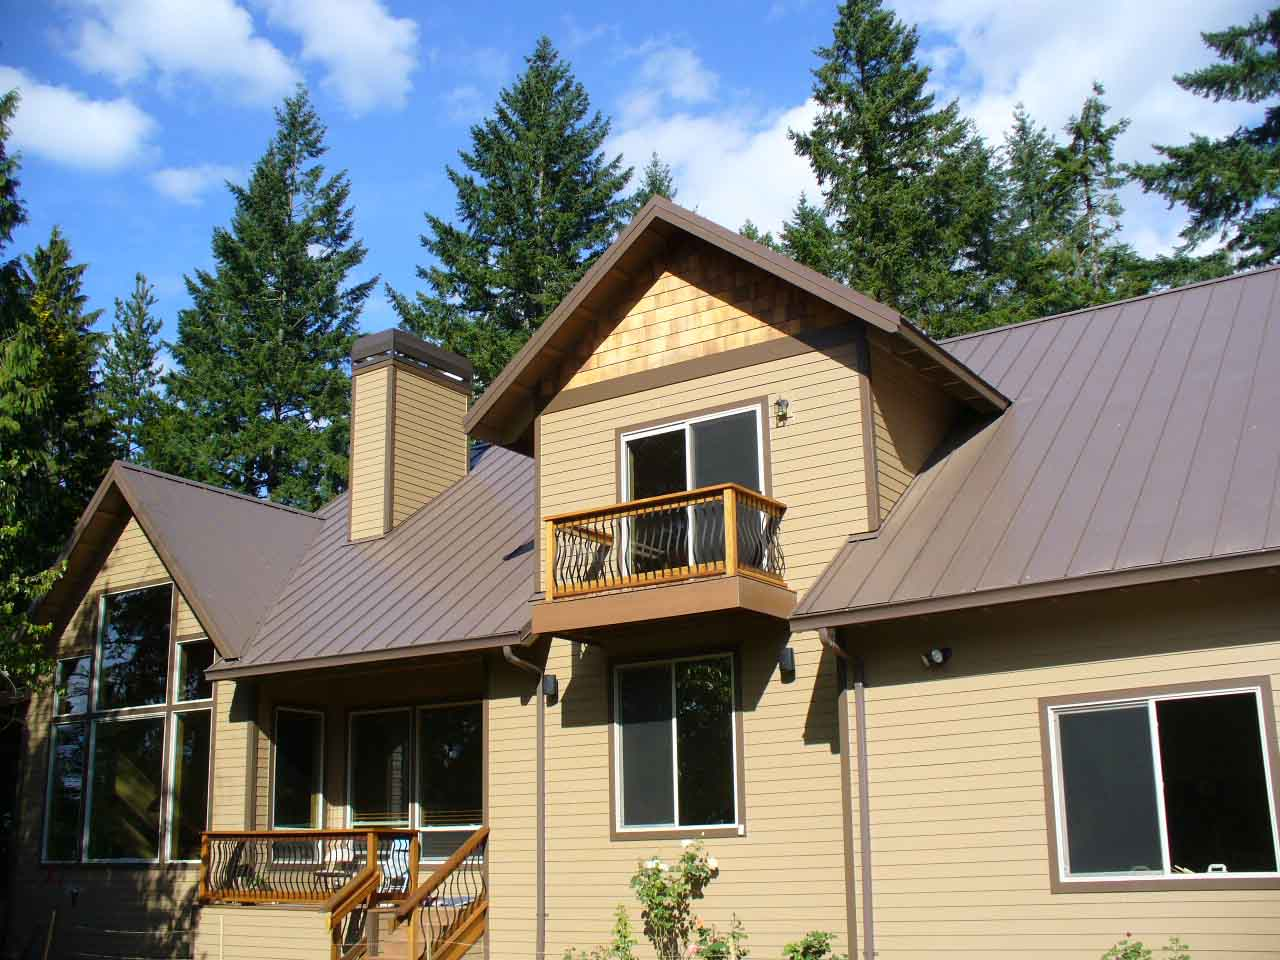 Loc-seam roof. 40 year warrinty